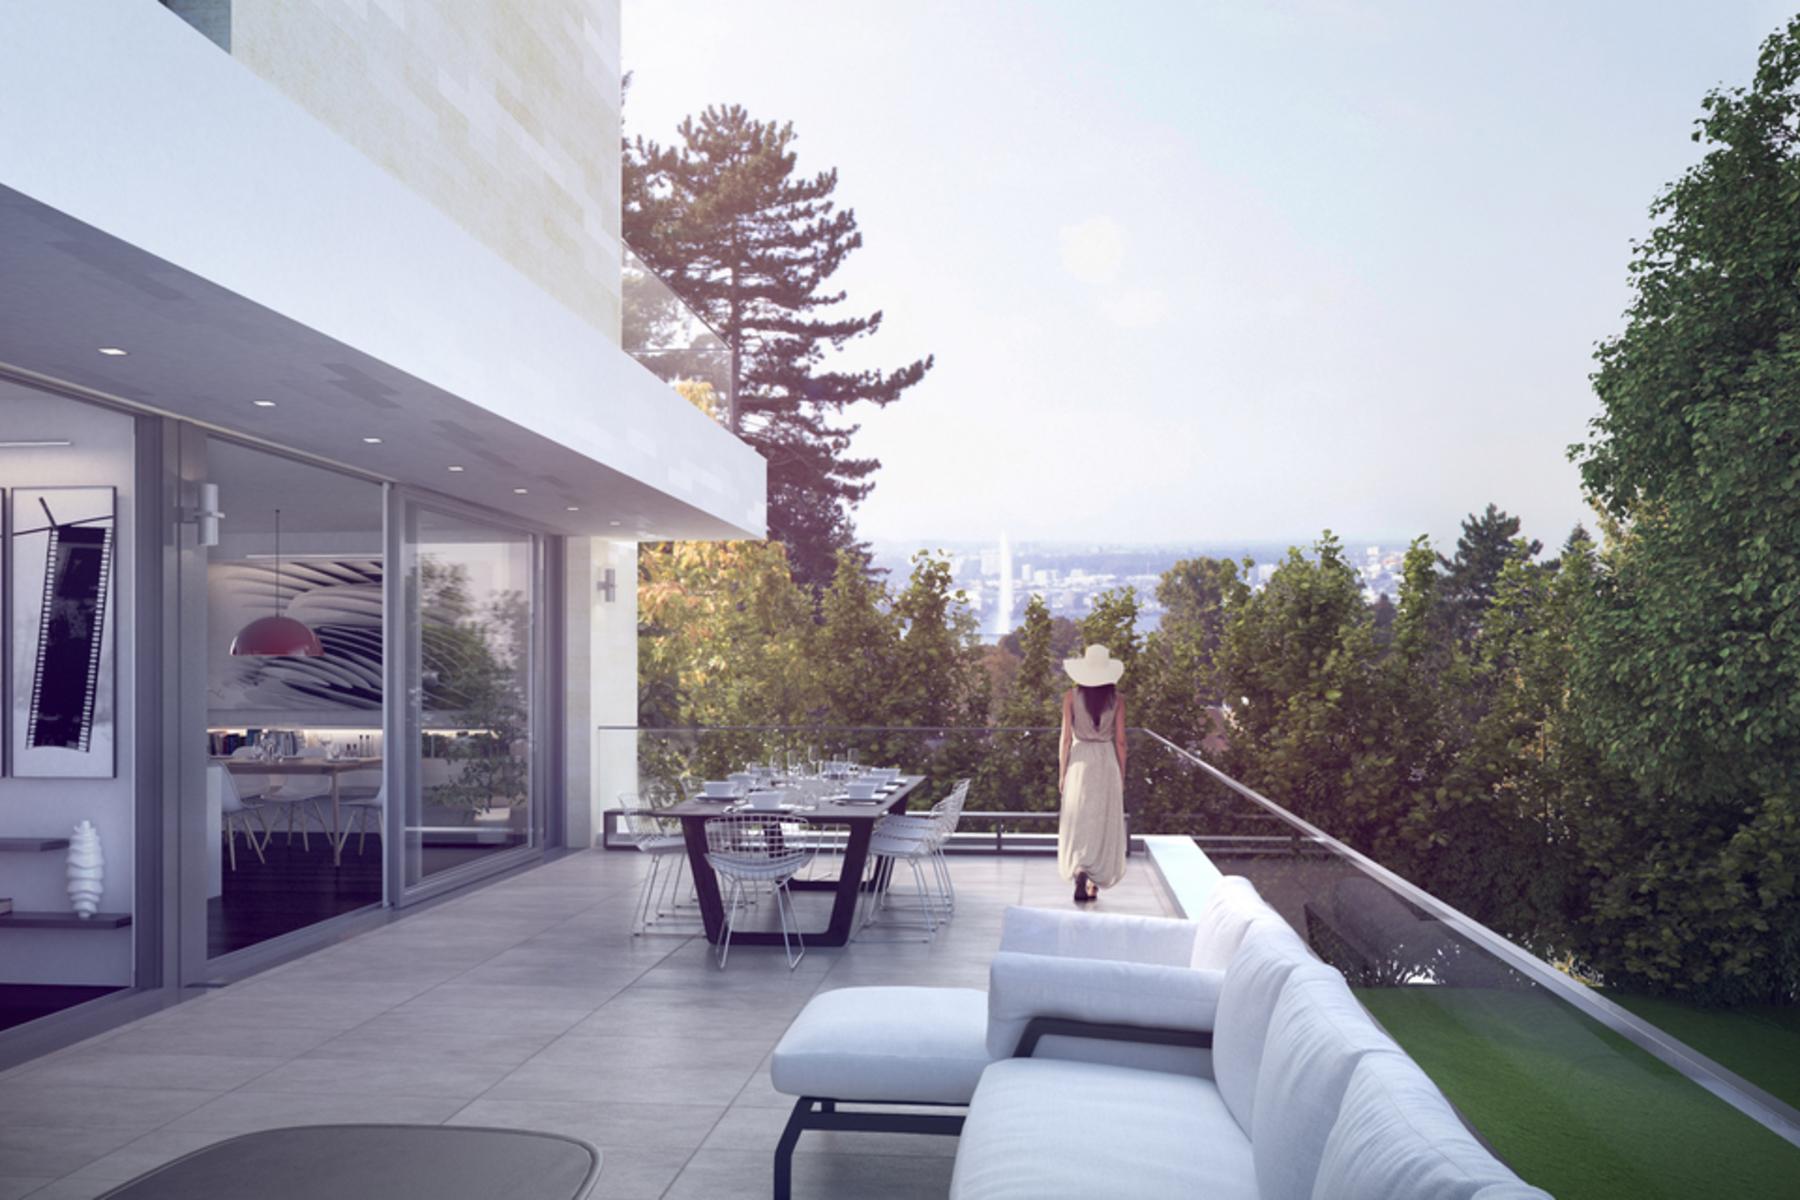 Apartments por un Venta en Building 1 Duplex lots 5.04 & 6.01 - 8 rooms - 2nd and 3rd floors Cologny Cologny, Ginebra 1223 Suiza